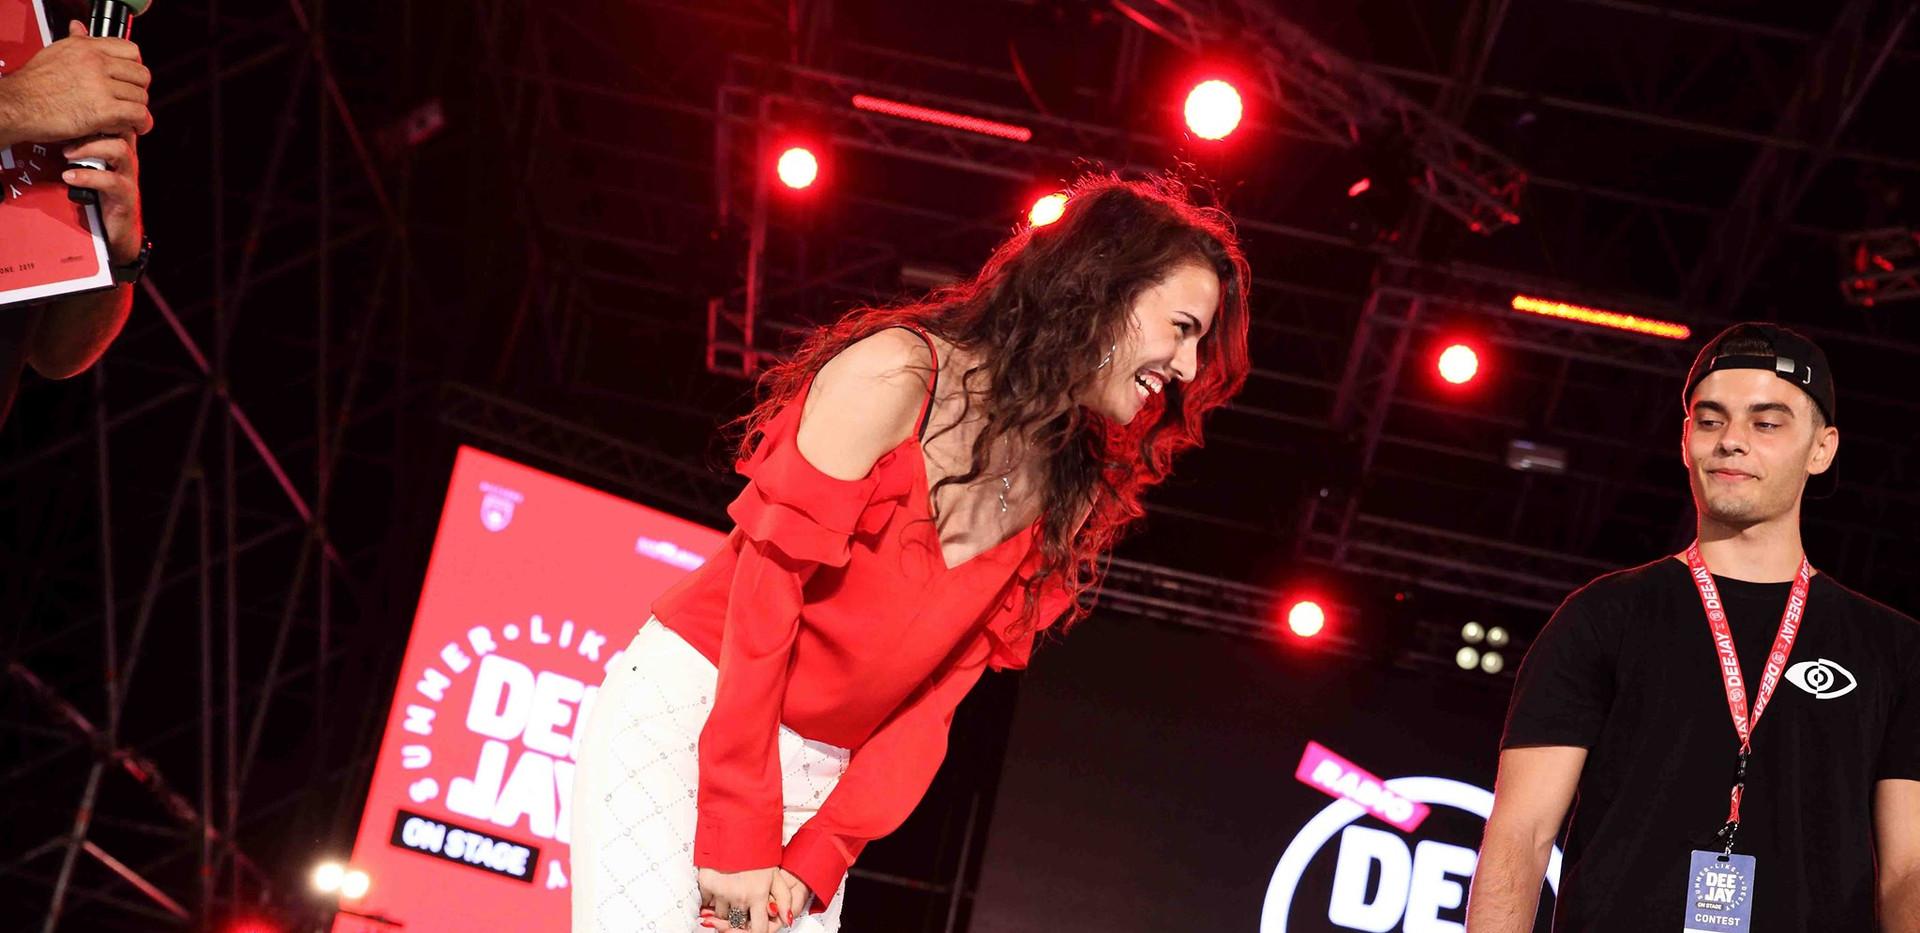 Silvia deejay on stage 18.jpg